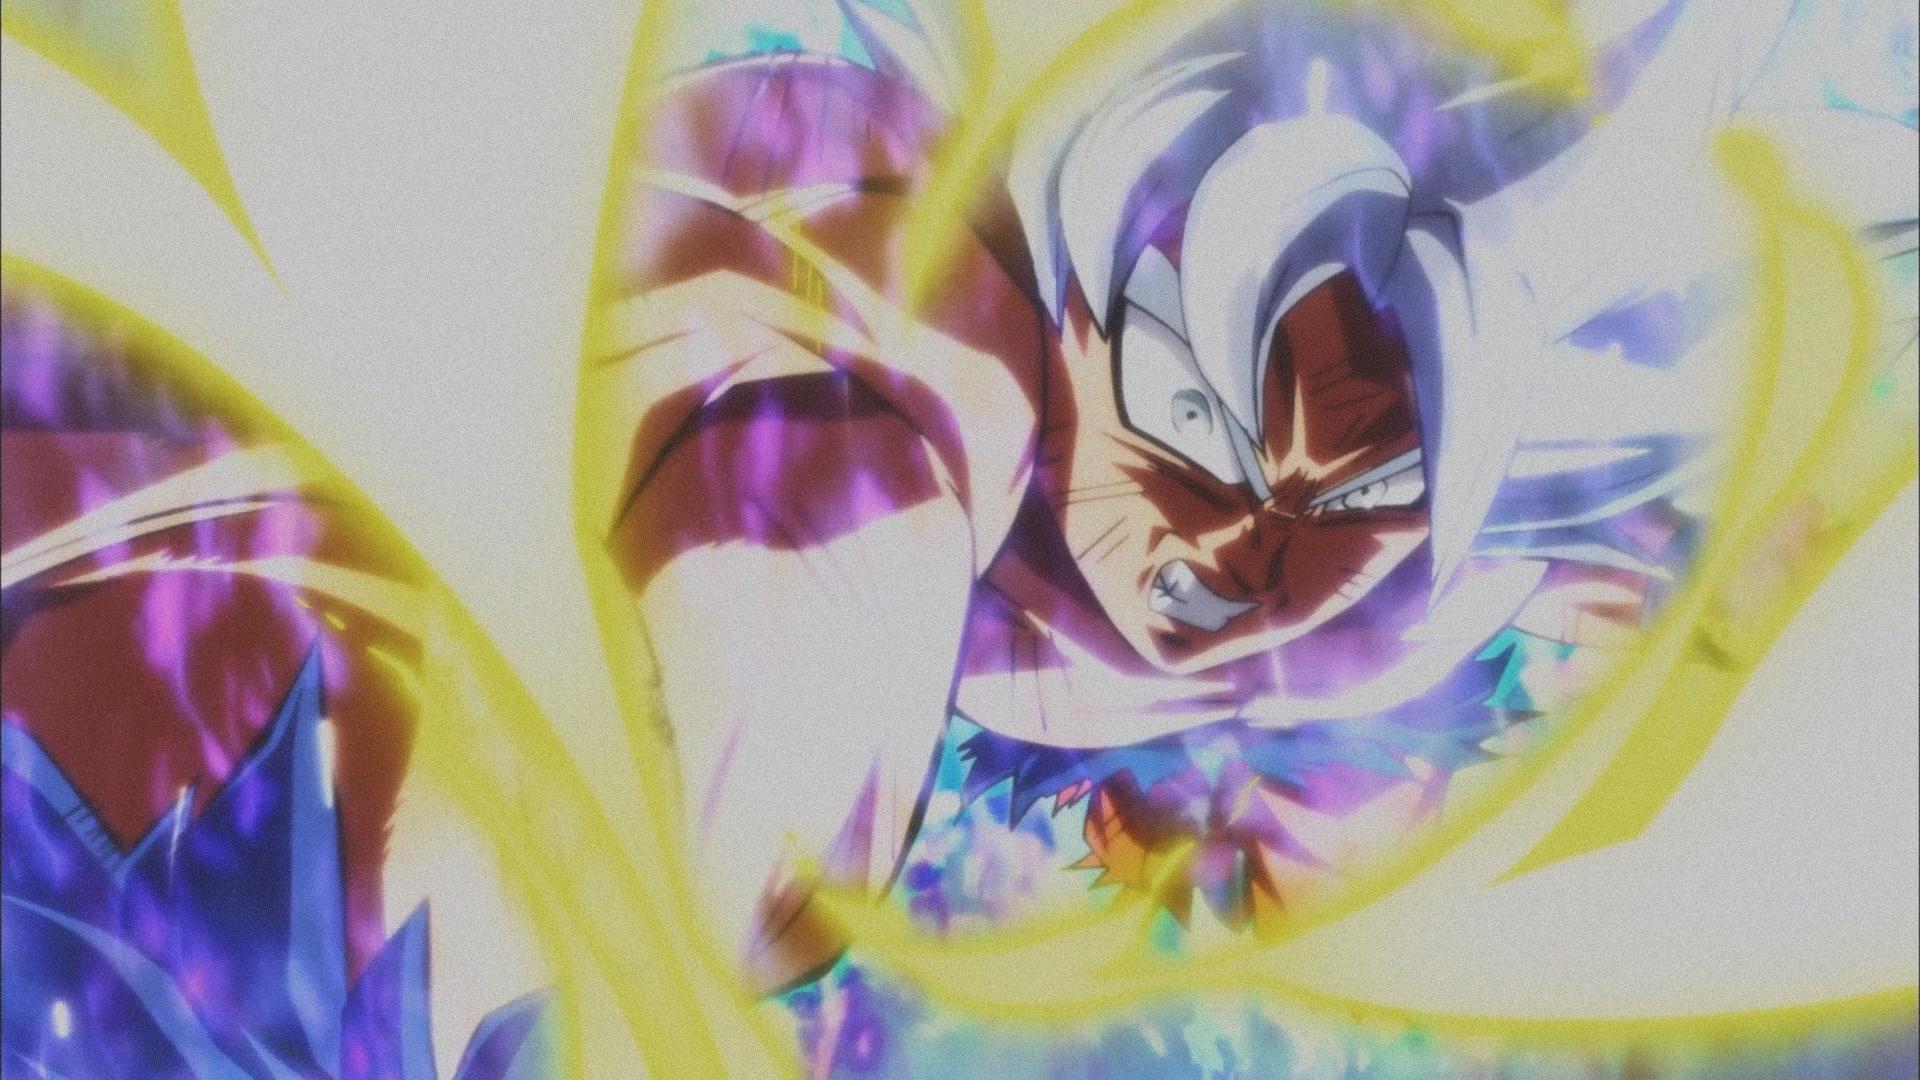 Wallpaper Son Goku Vegeta Dragon Ball Super Saiyan Blue